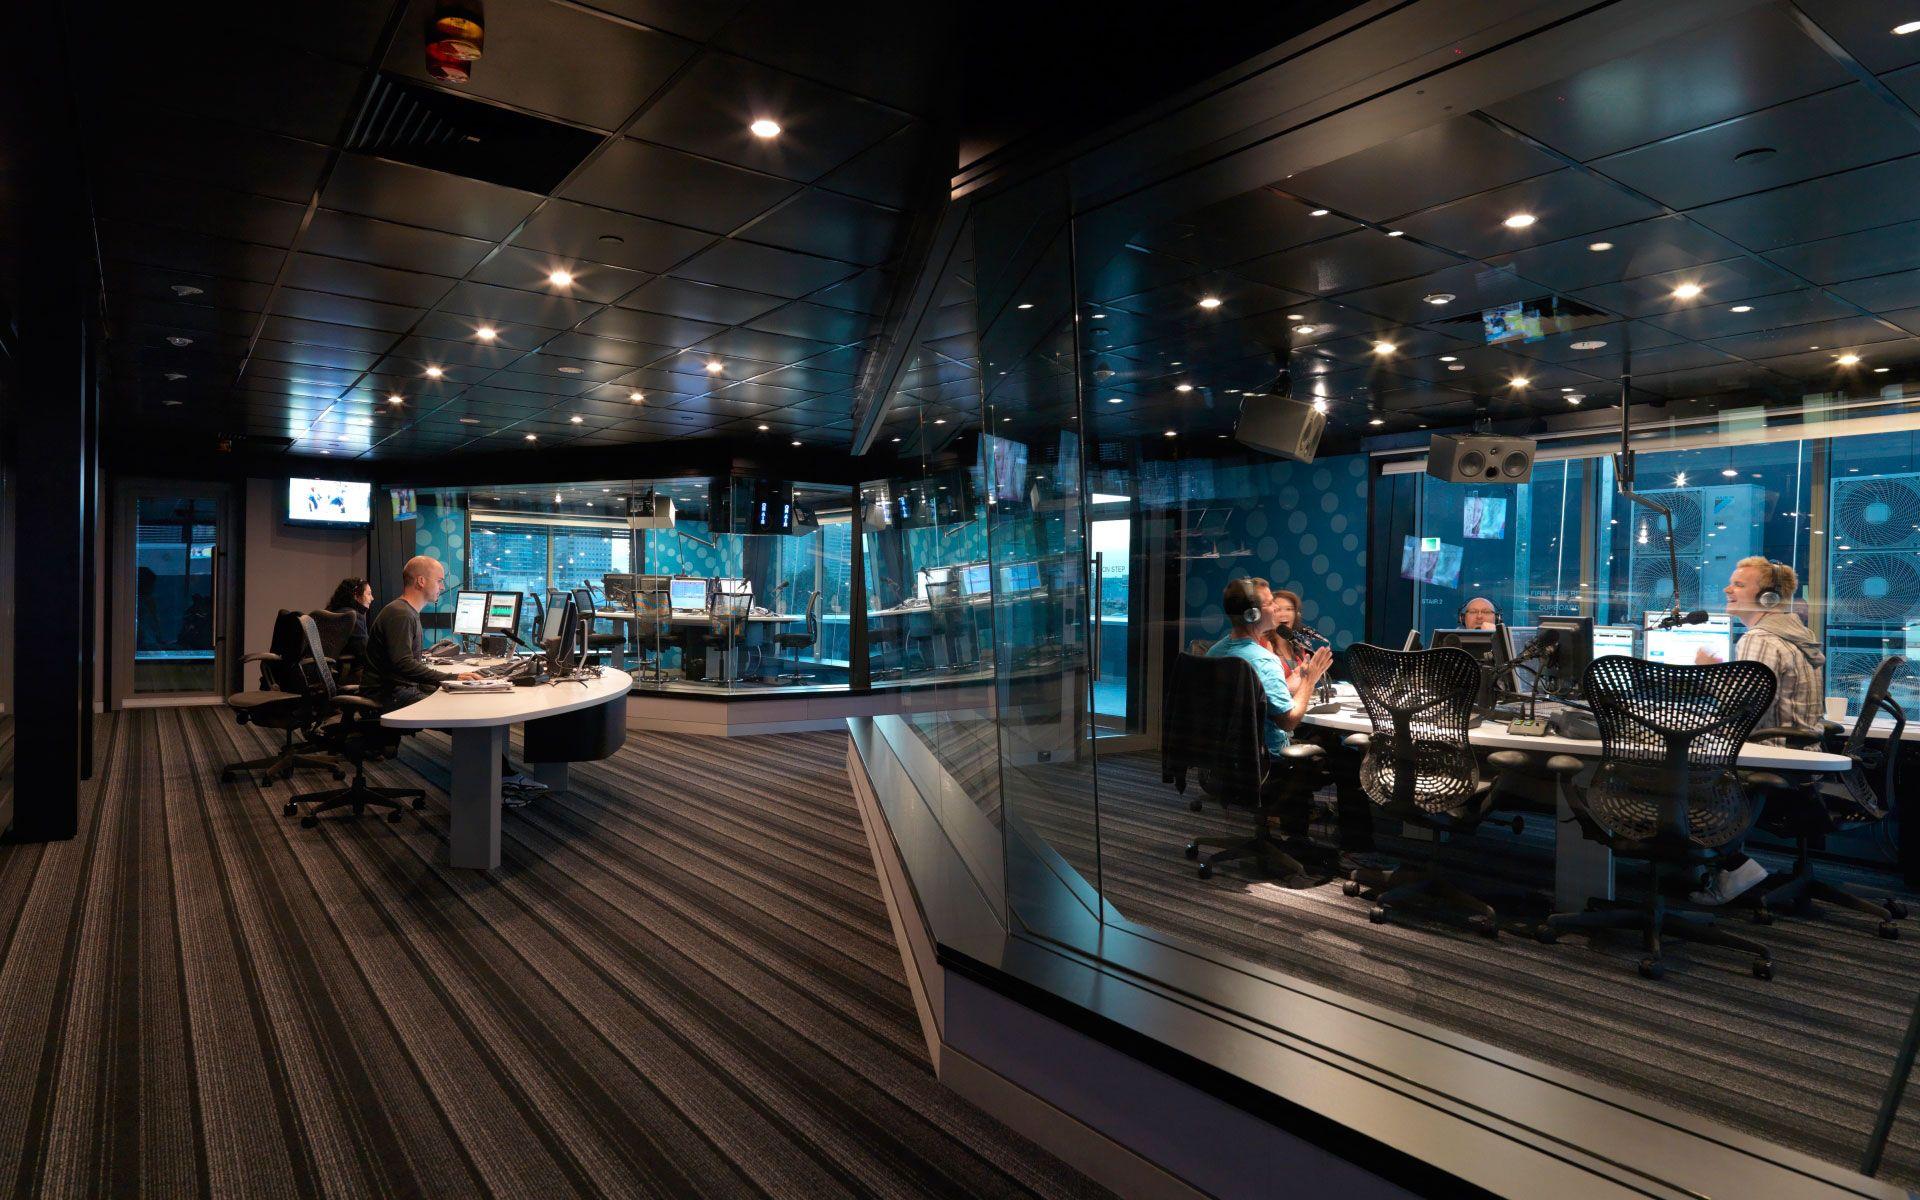 office radios. Radio Station Office Design - Google Search Radios